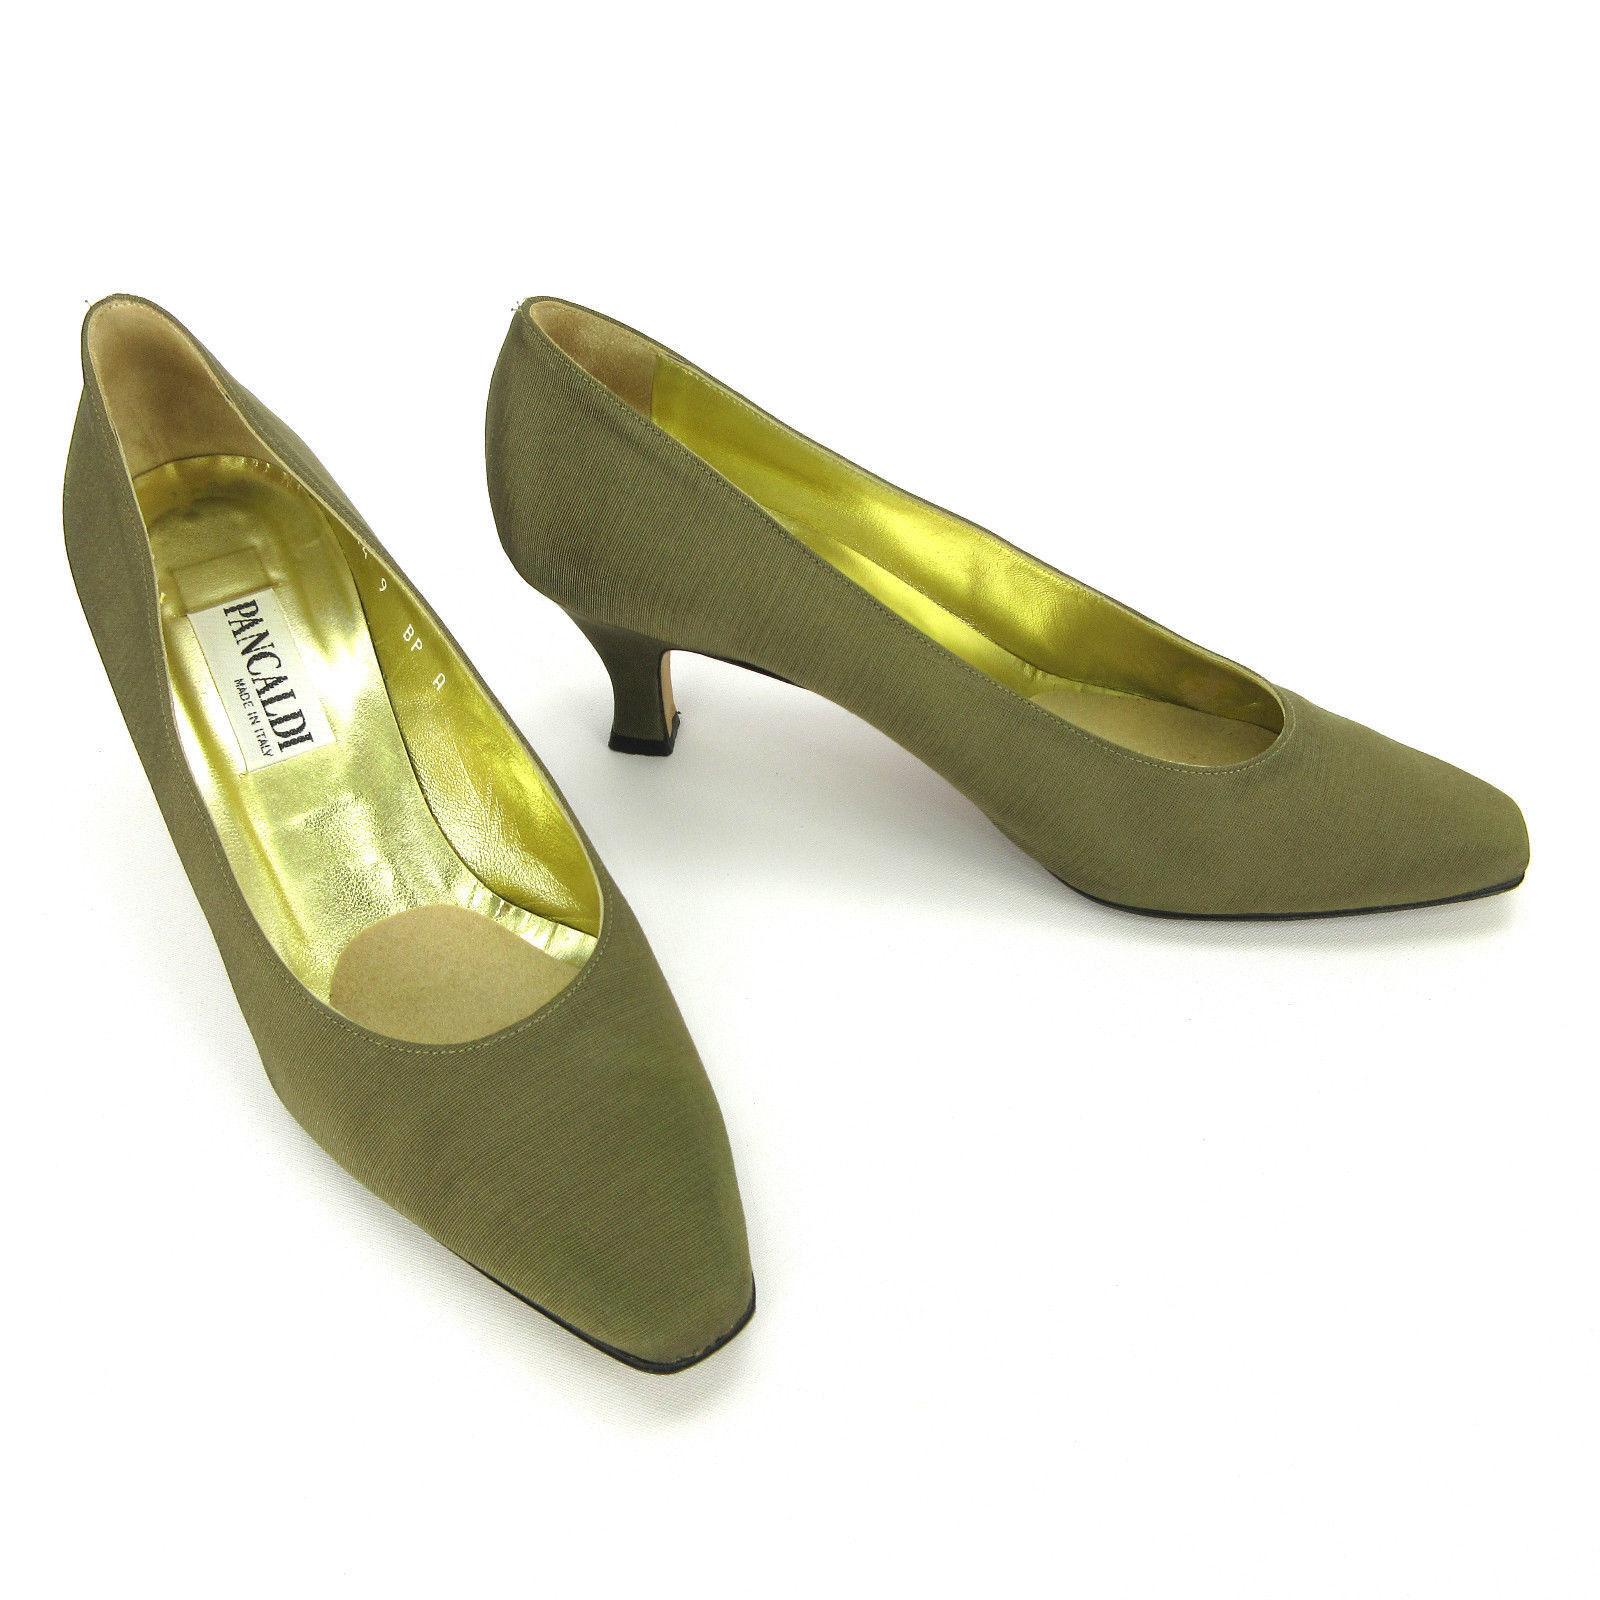 Pancaldi Womens Textured Heels 9 B Bronze Textured Womens Fabric Square Toe Slip On Pumps Italy cdd935